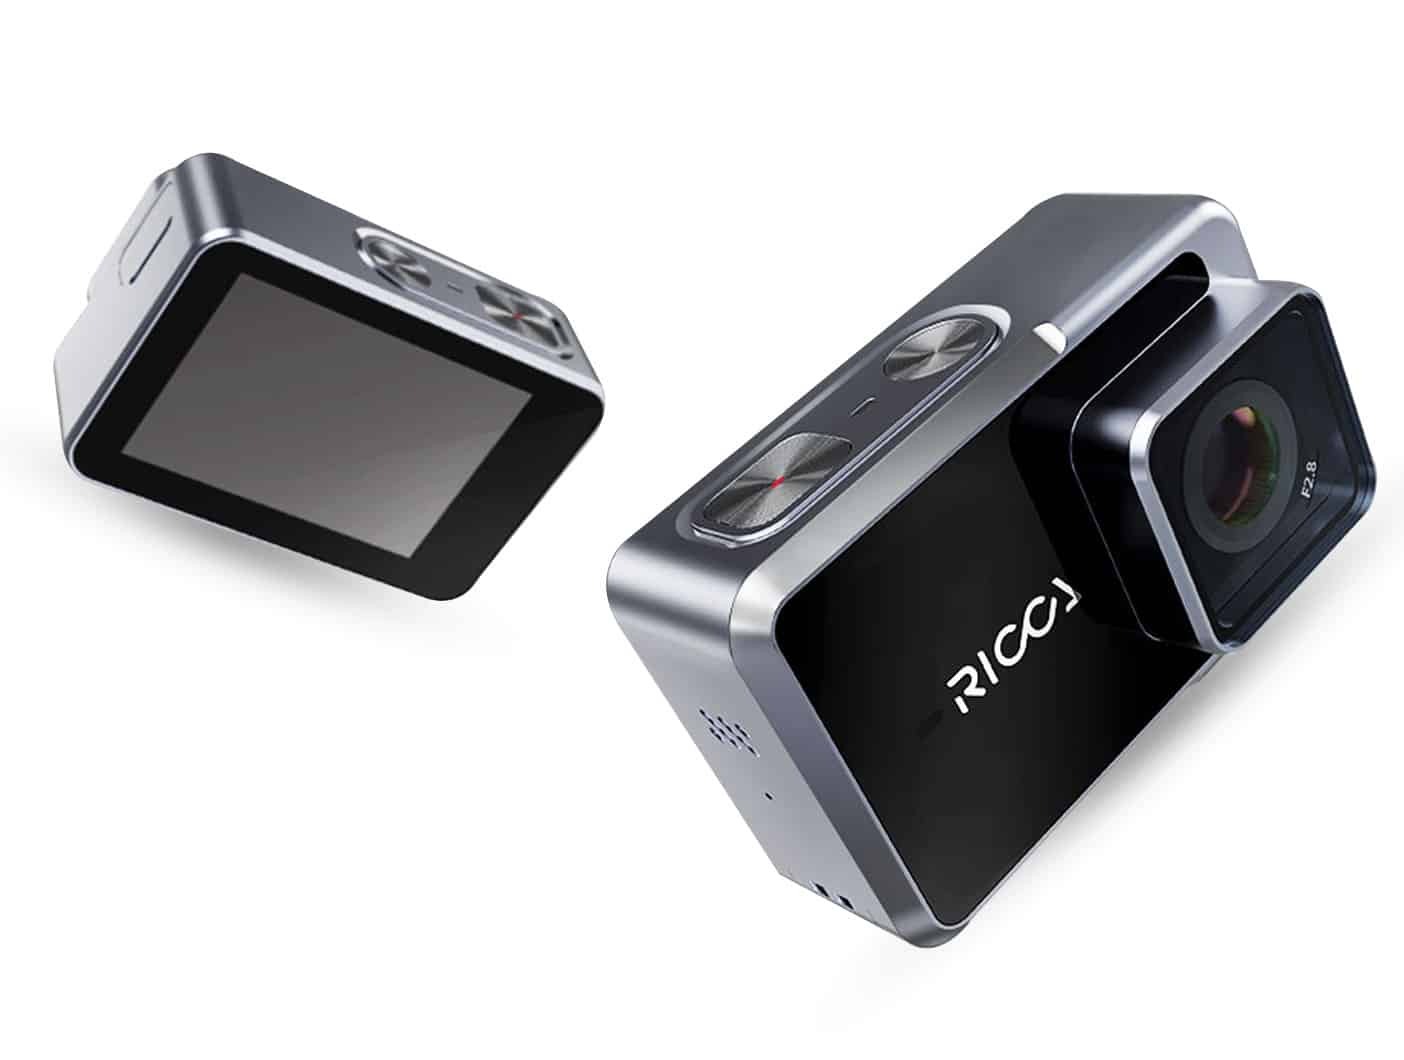 FeiyuTech Ricca 4k Waterproof Action Camera